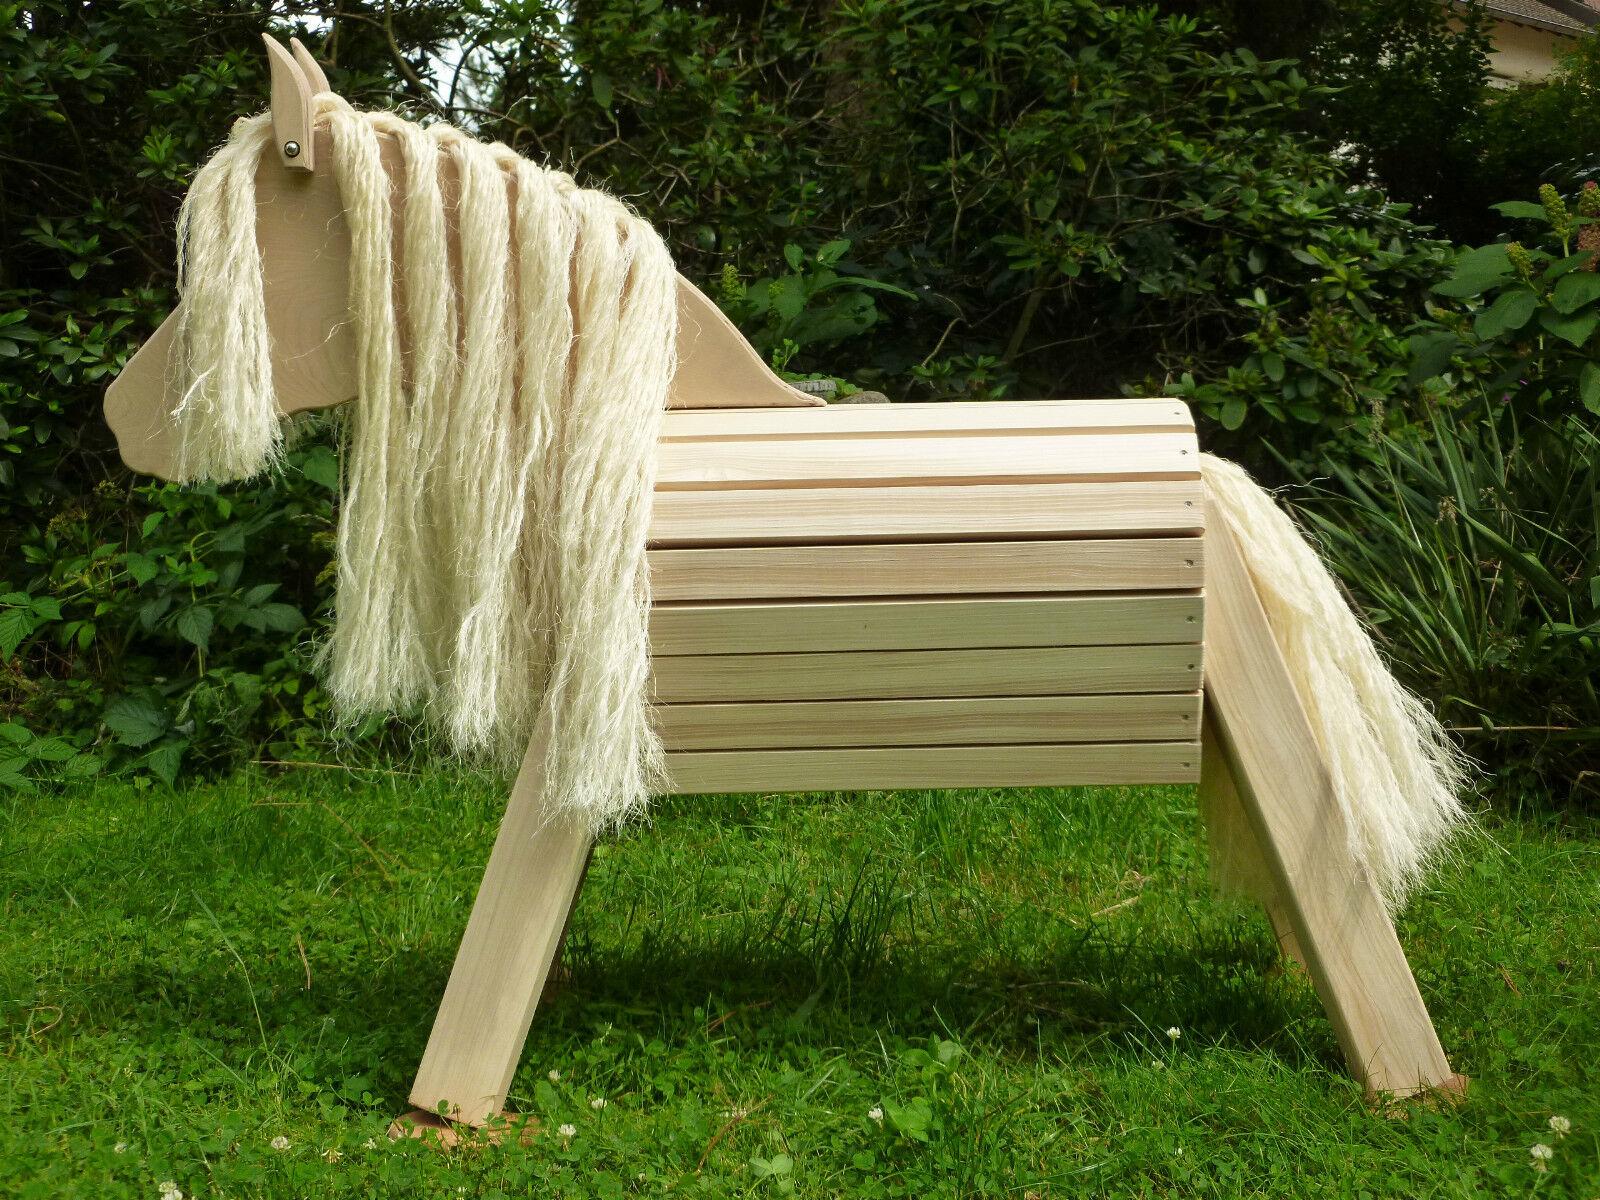 65cm Holzpferd Holzpony Voltigierpferd Pferd Pony unlasiert NEU